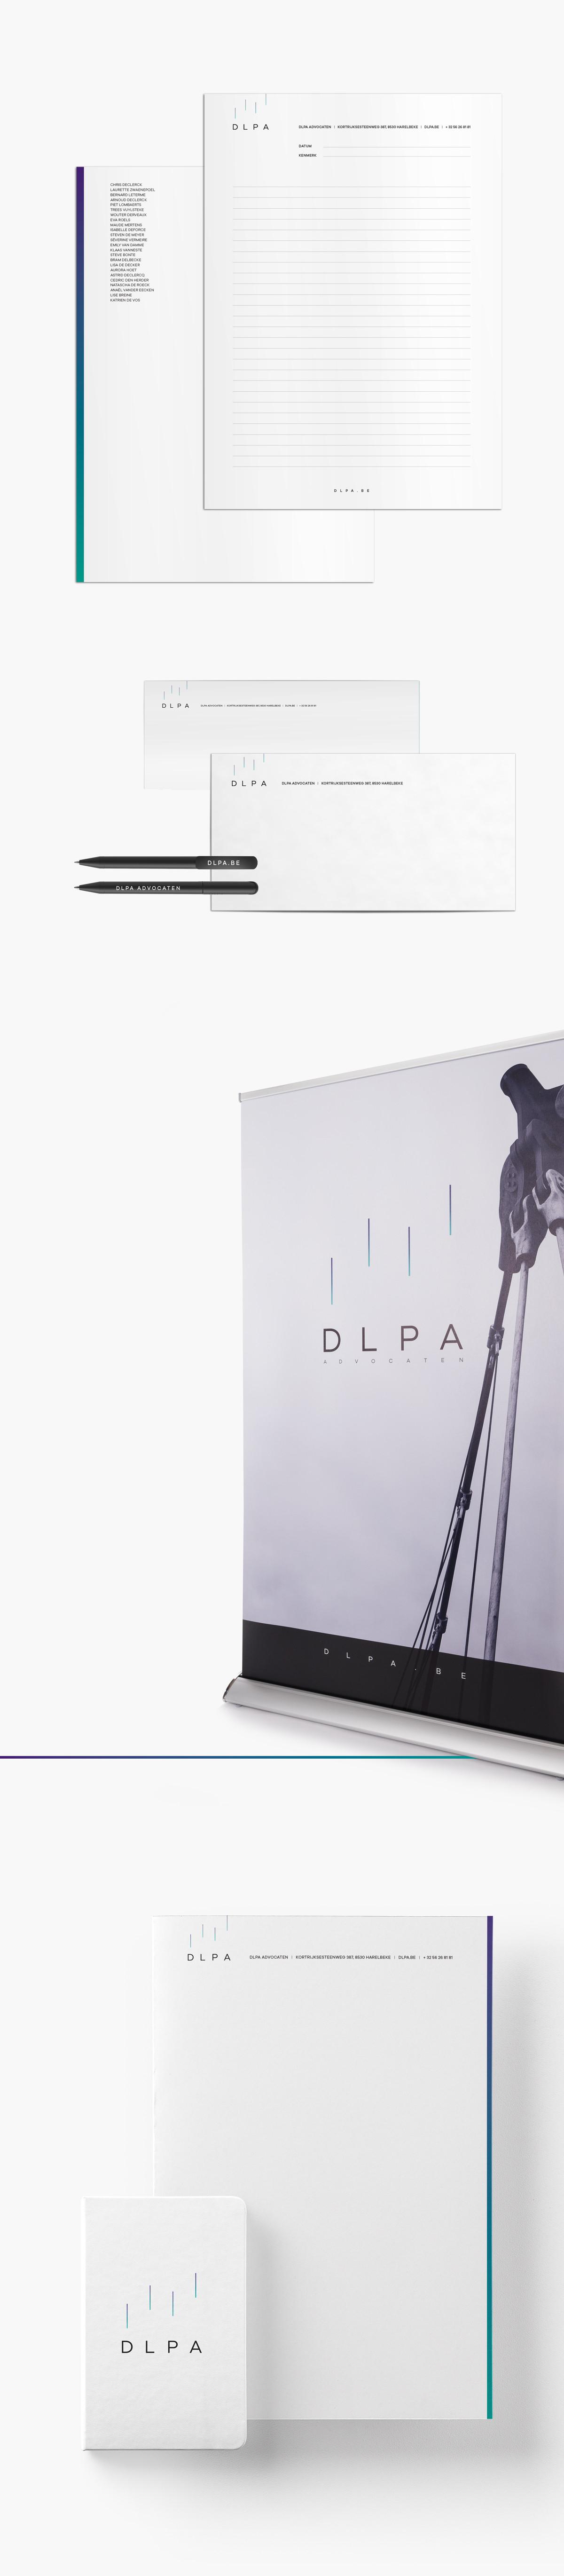 DLPA_Presentatie_02.0.jpg